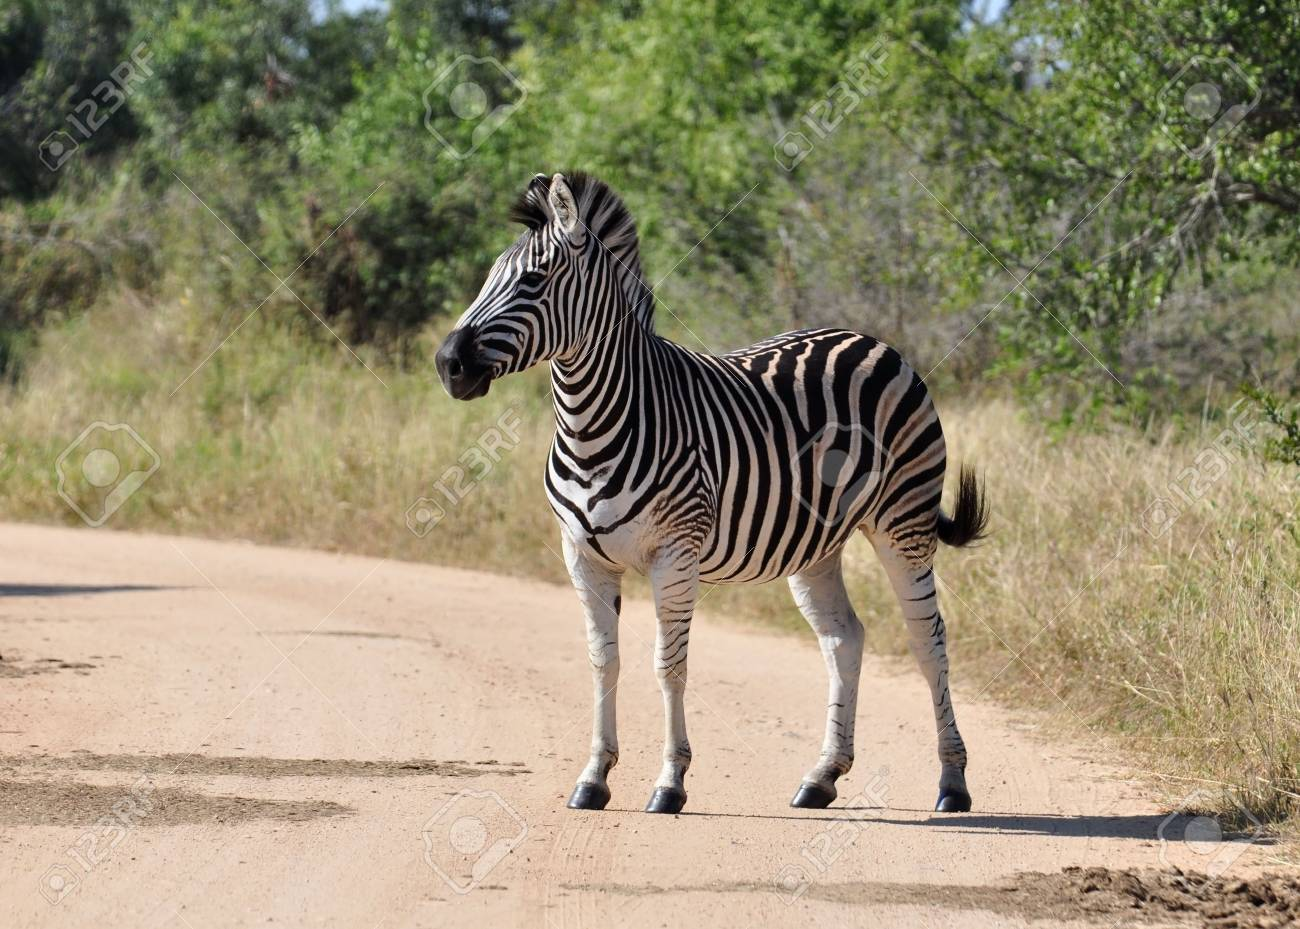 A Burchells Zebra (Equus quagga burchelli) in the Kruger Park, South Africa Stock Photo - 7536276